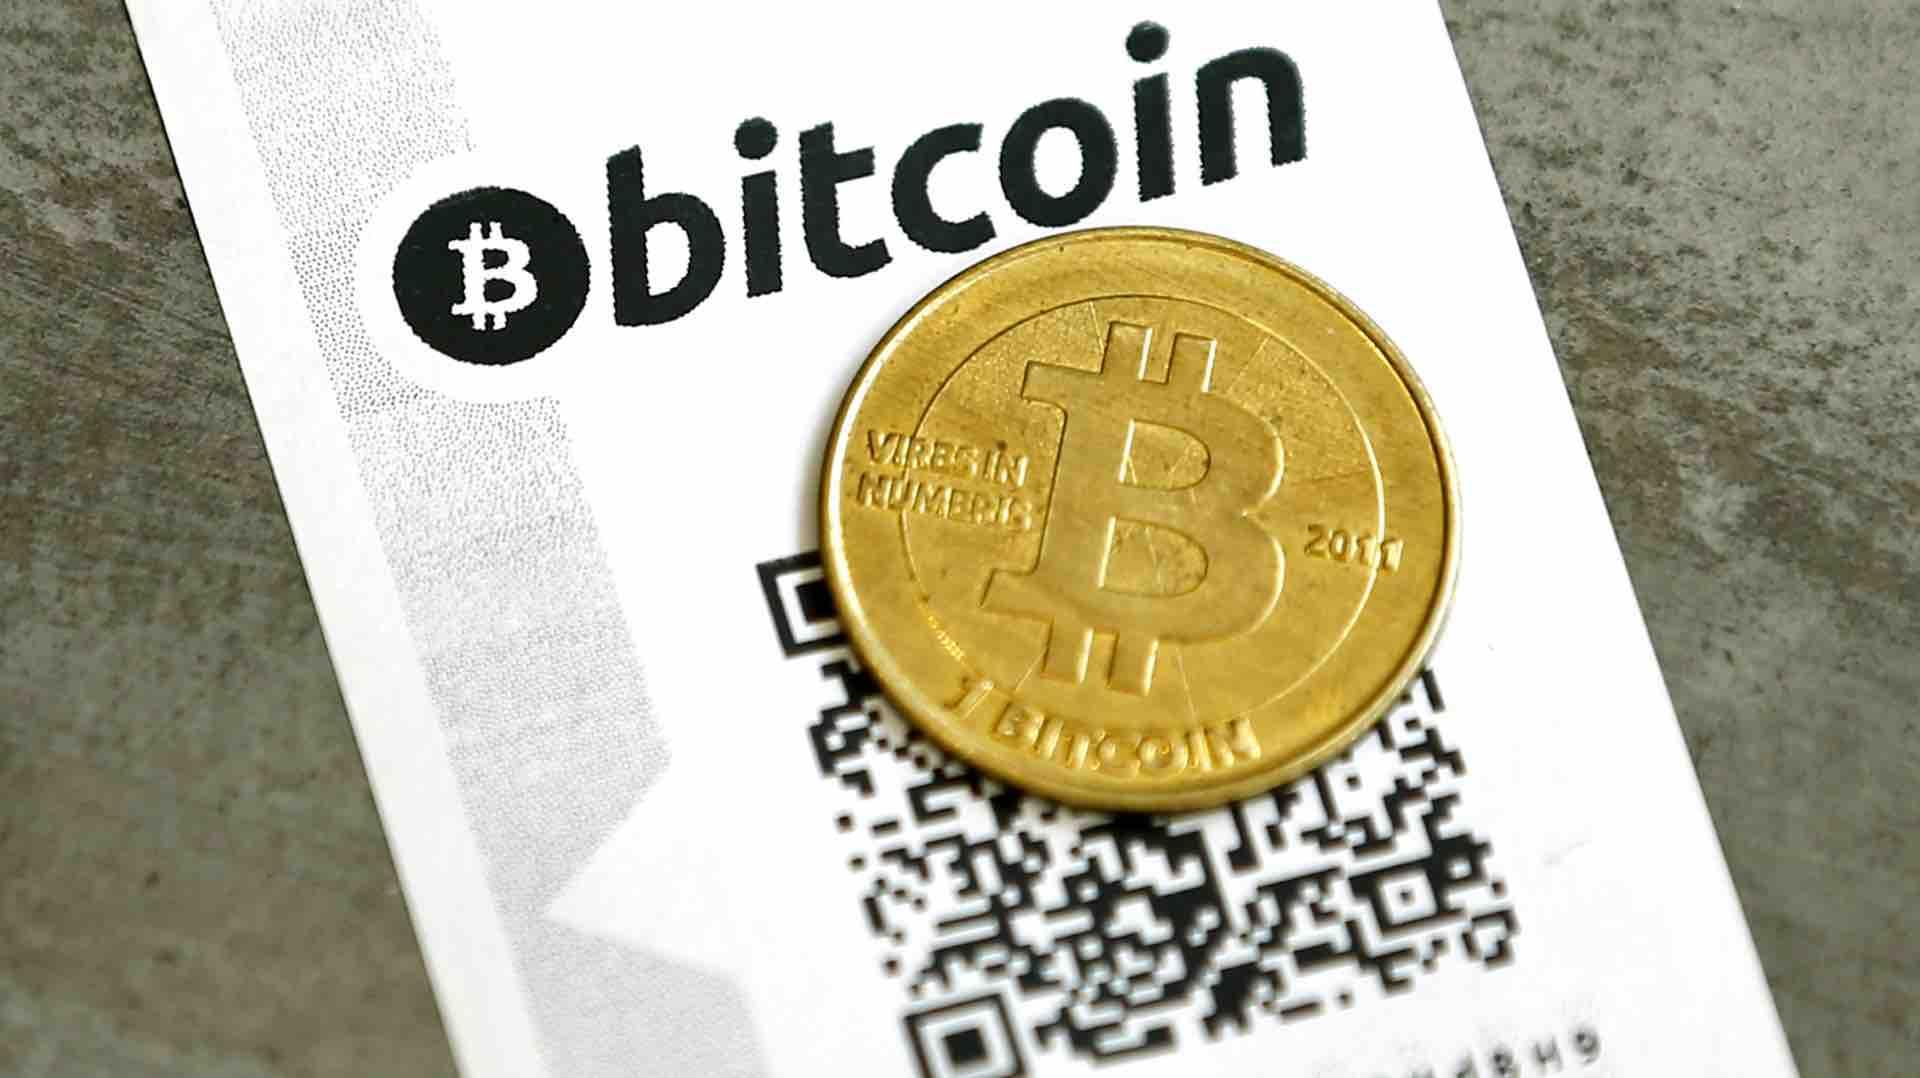 jósolt bitcoin